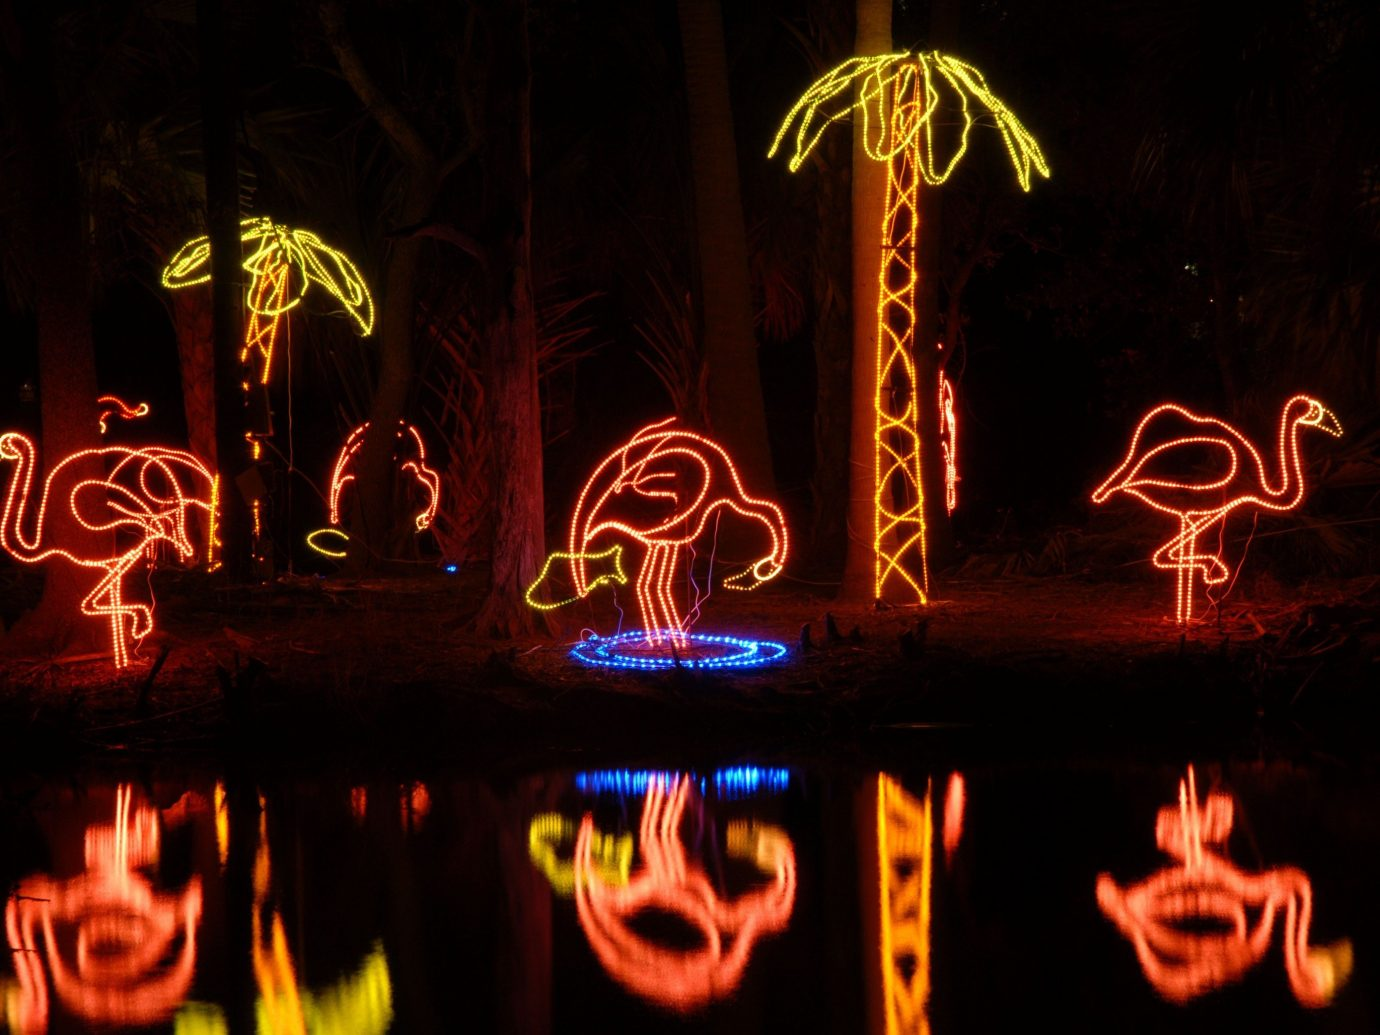 Offbeat lit light night darkness Nature lighting christmas lights neon sign dark Fireplace